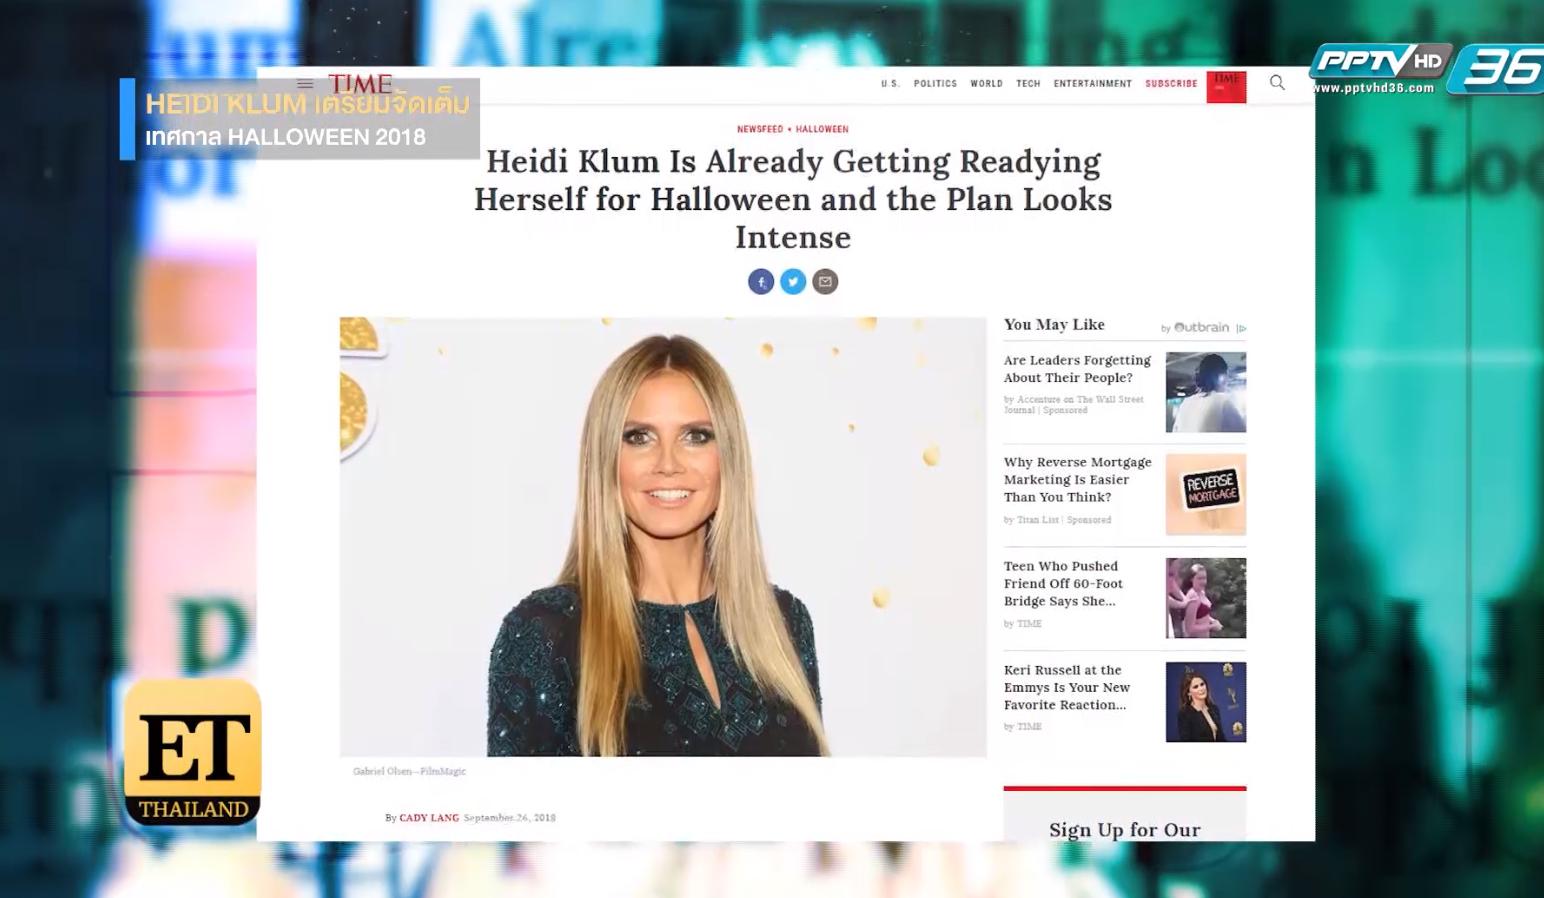 Heidi Klum เตรียมจัดเต็ม เทศกาล Halloween 2018